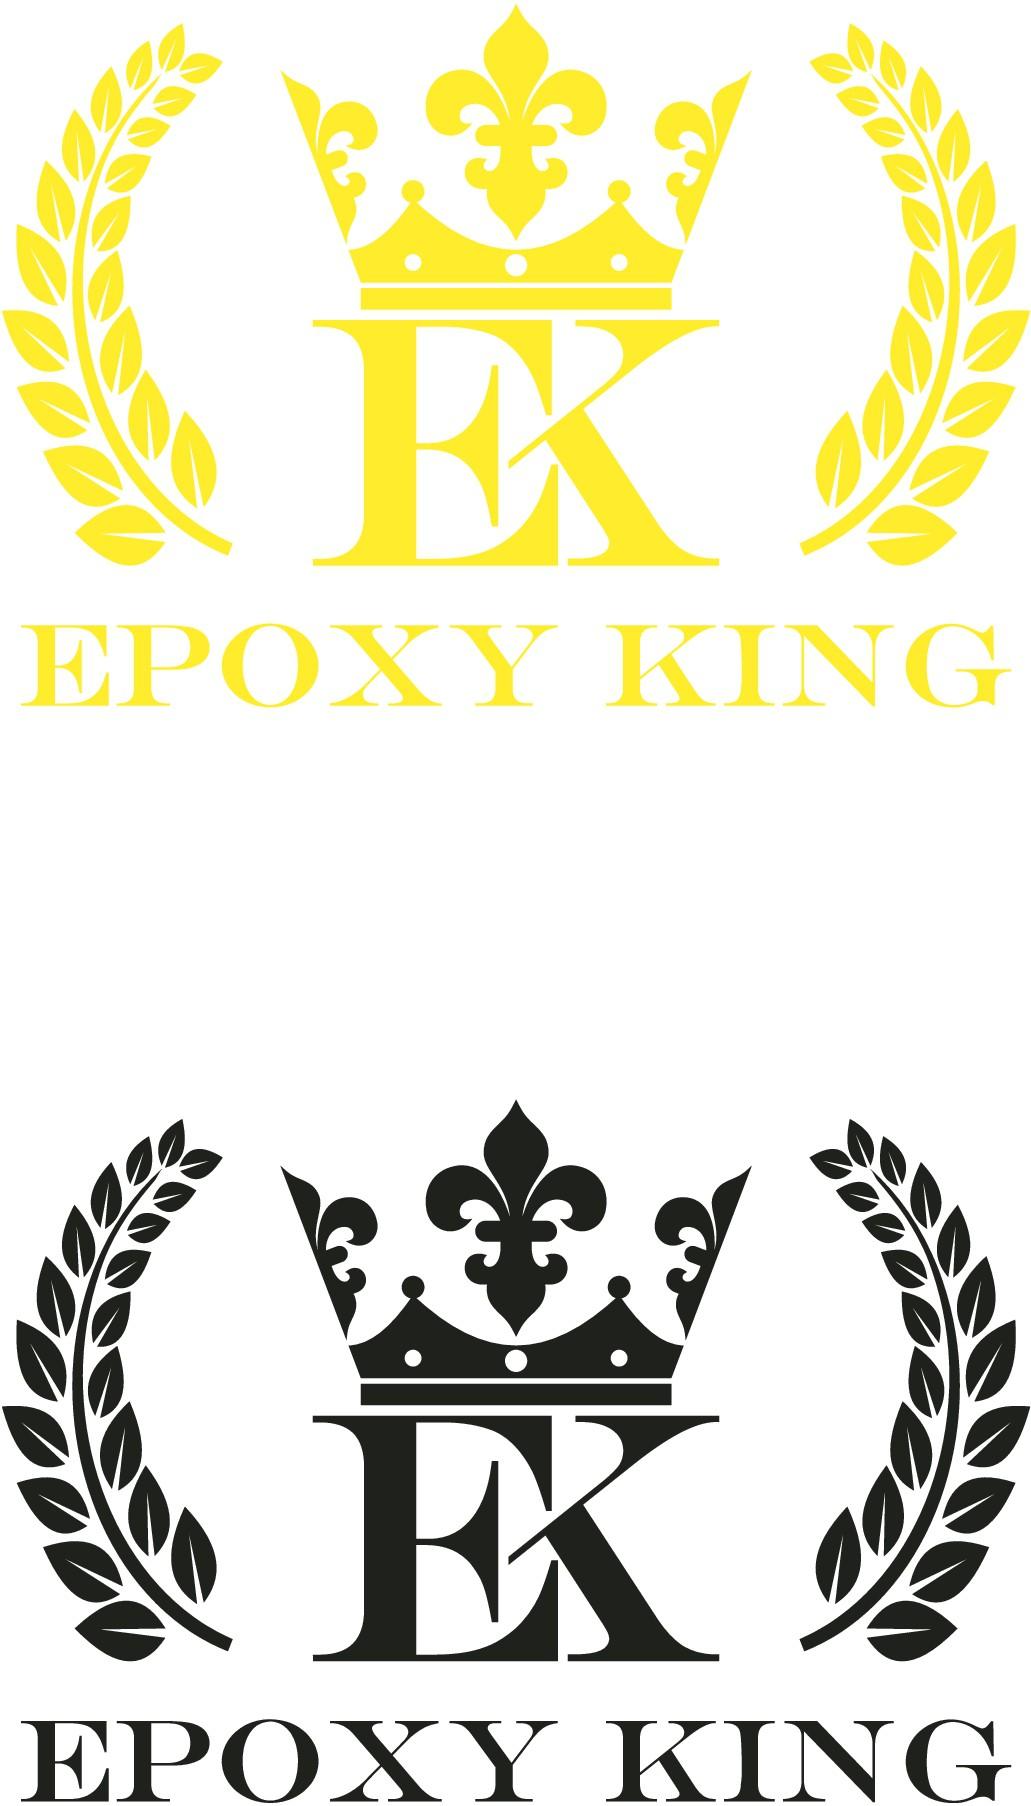 Epoxy King USA (Black/Gold)